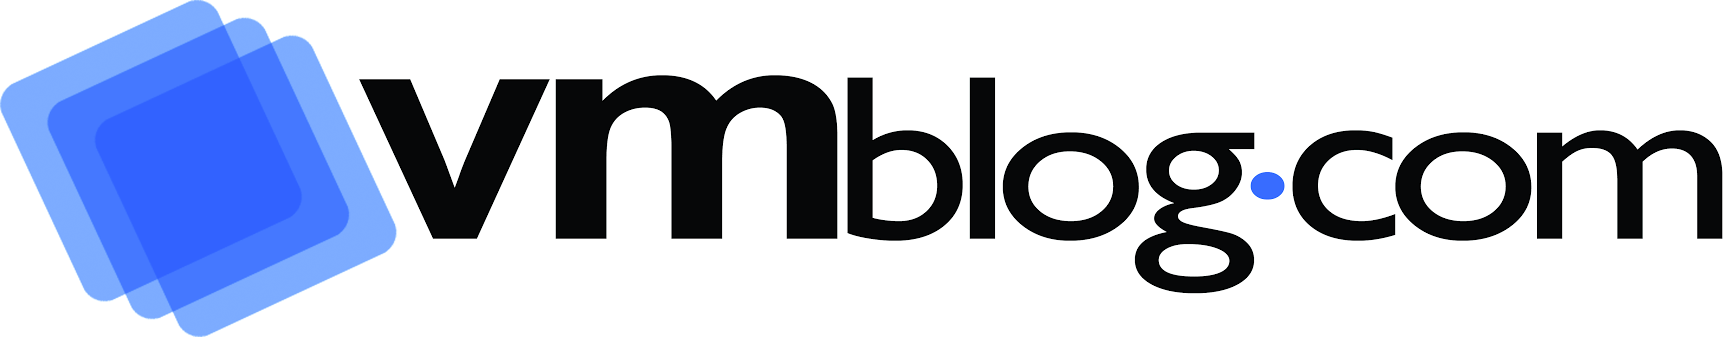 VMblog logo